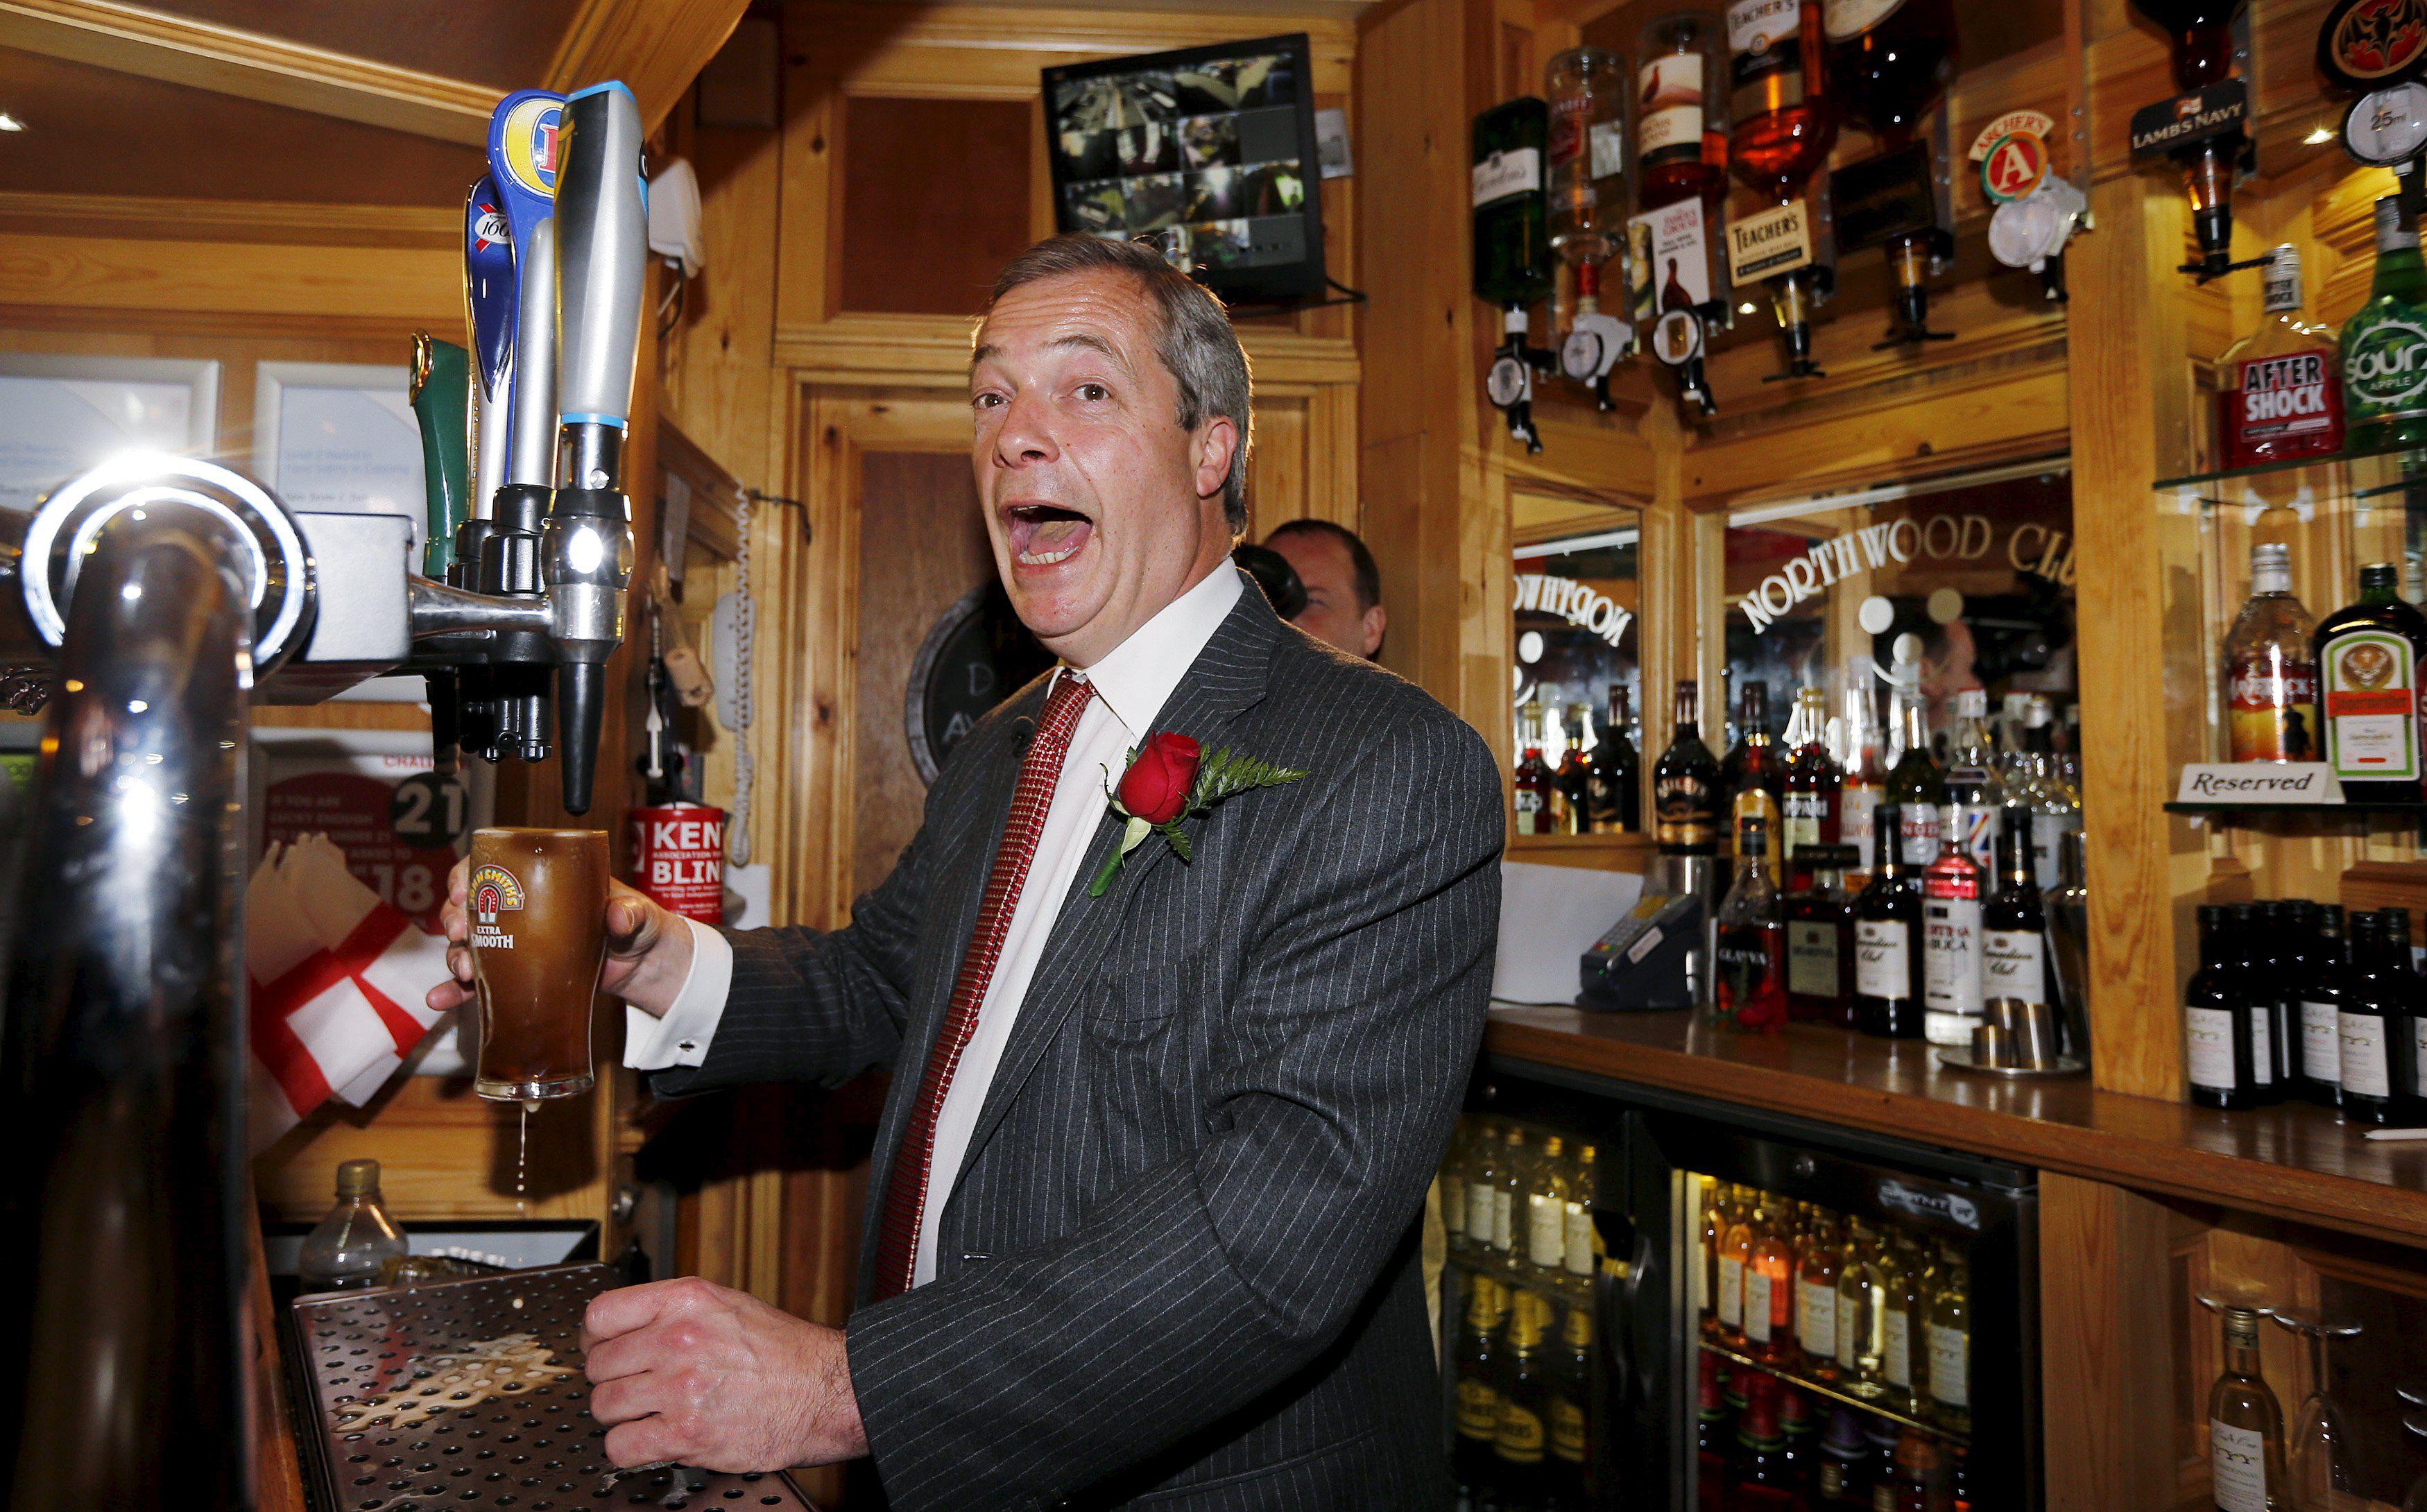 en el pub. El líder de UKIP